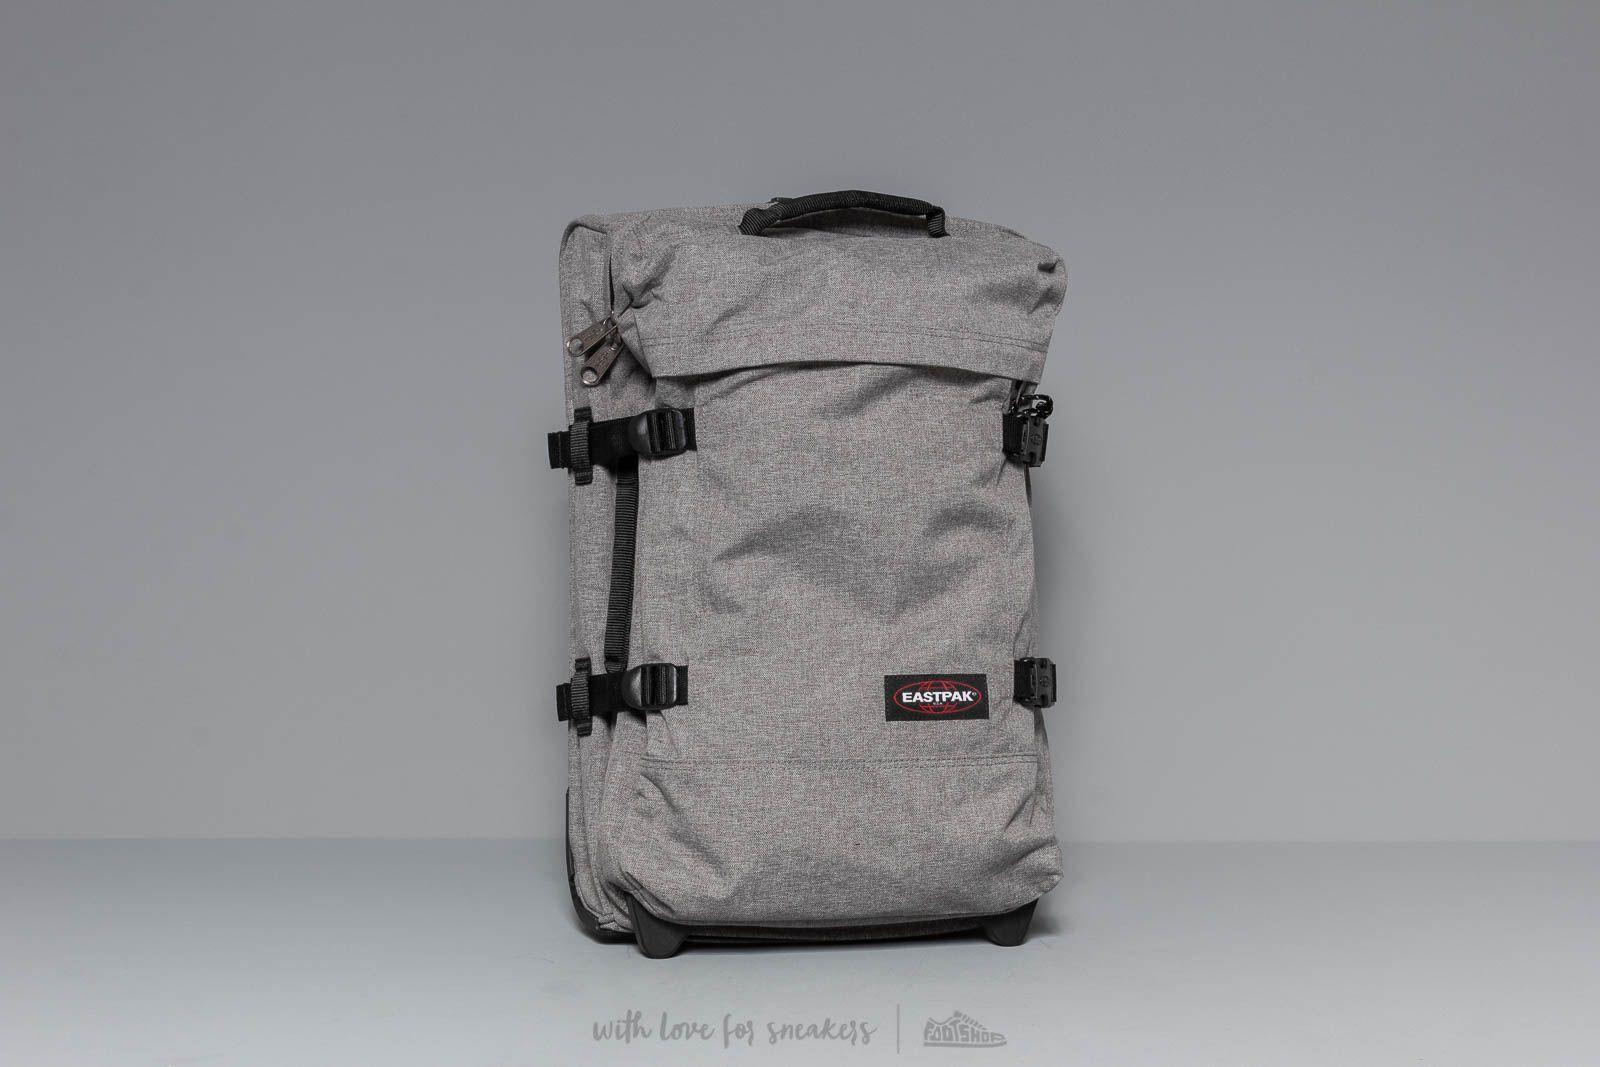 Eastpak Tranverz Travel Luggage Sunday Grey za skvelú cenu 92 € kúpite na Footshop.sk